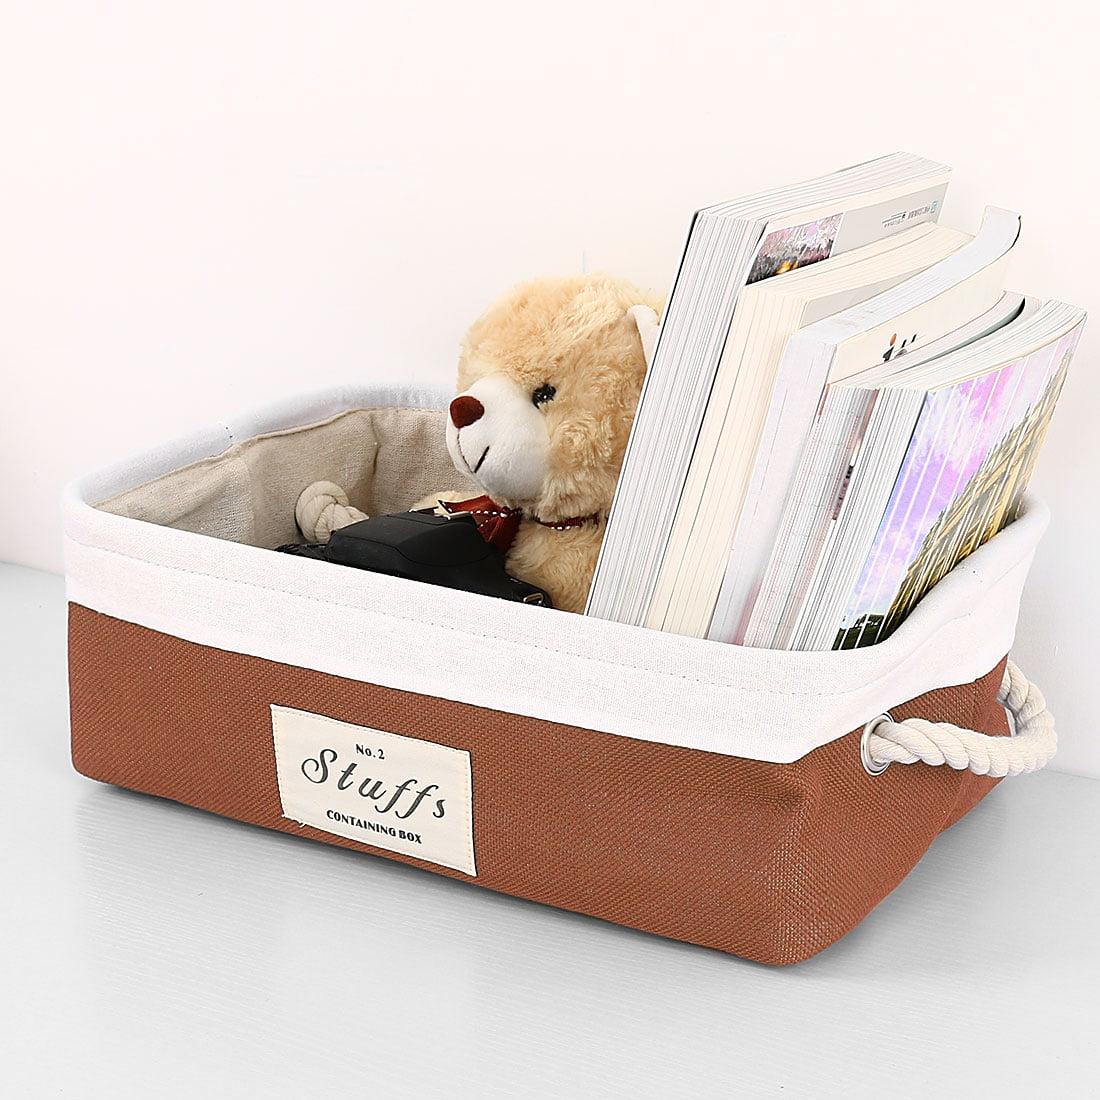 Collapsible Storage Baskets Bin Container With Handle Toys Storage Organizer Shelf Basket,3 Size